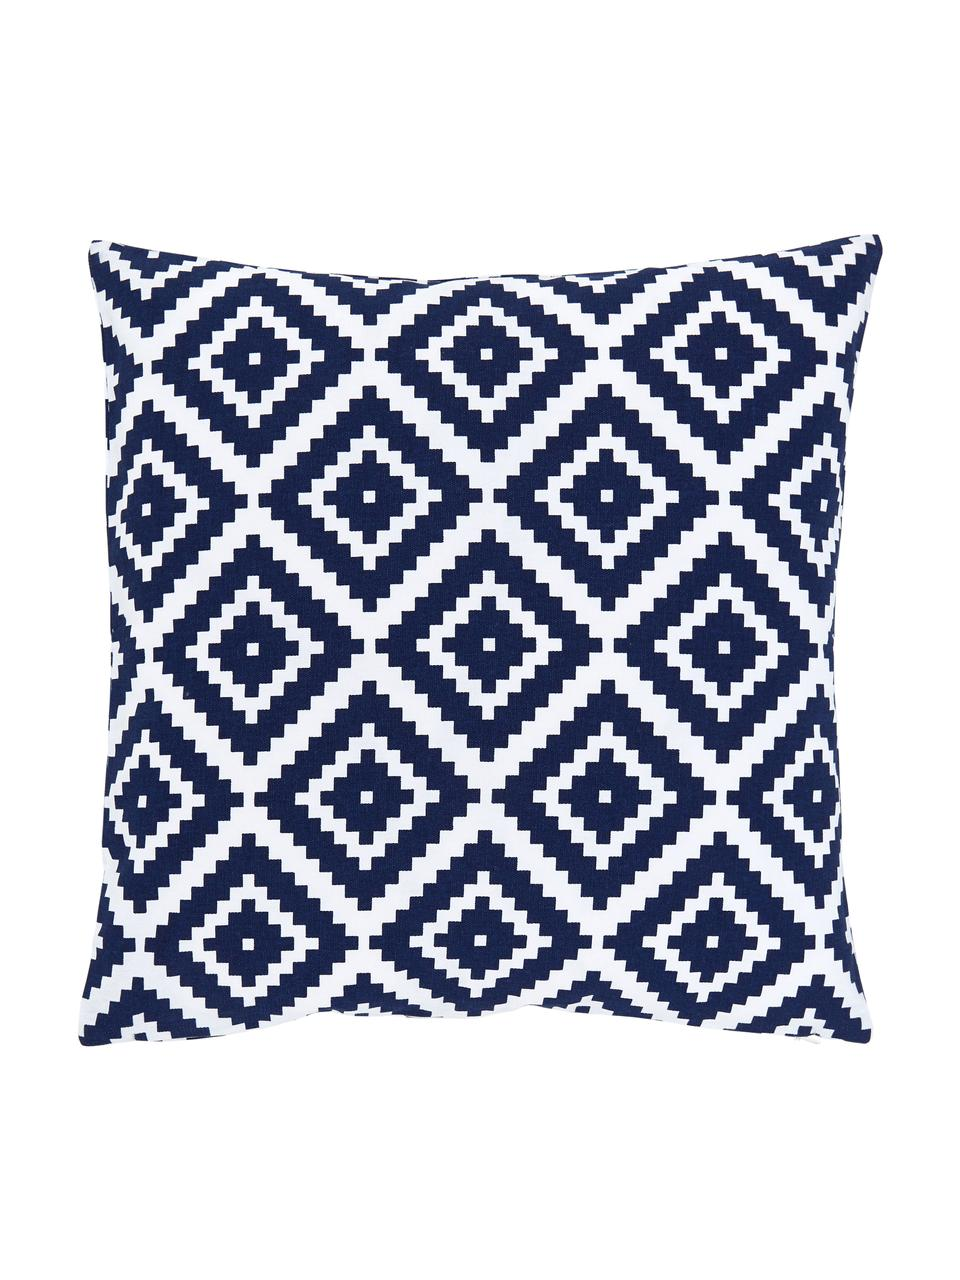 Kissenhülle Miami in Dunkelblau/Weiß, 100% Baumwolle, Blau, 45 x 45 cm